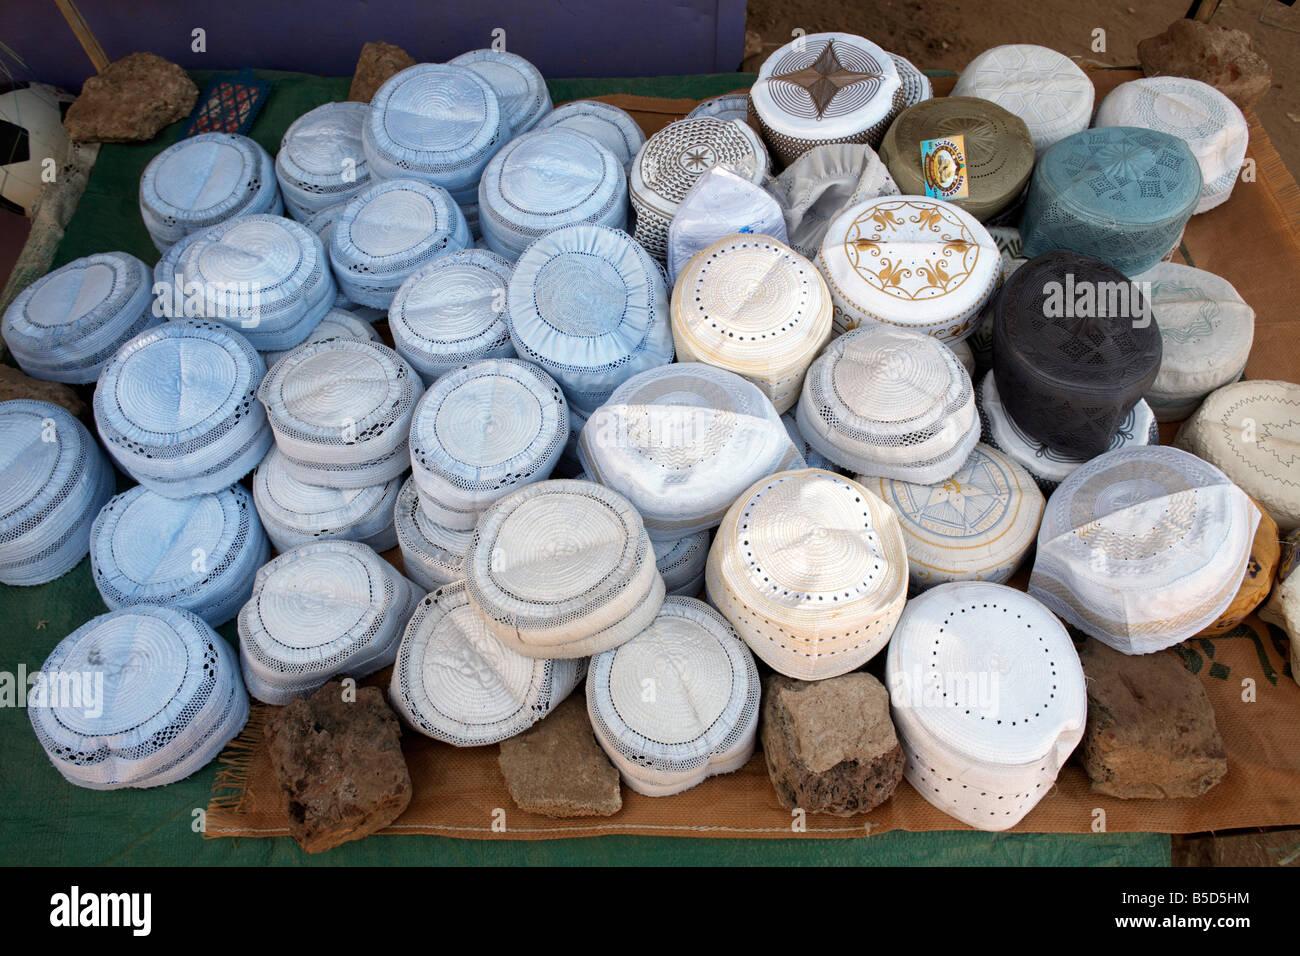 4c75f406c4a Islamic caps (Muslim hats) on sale in the town of Shendi